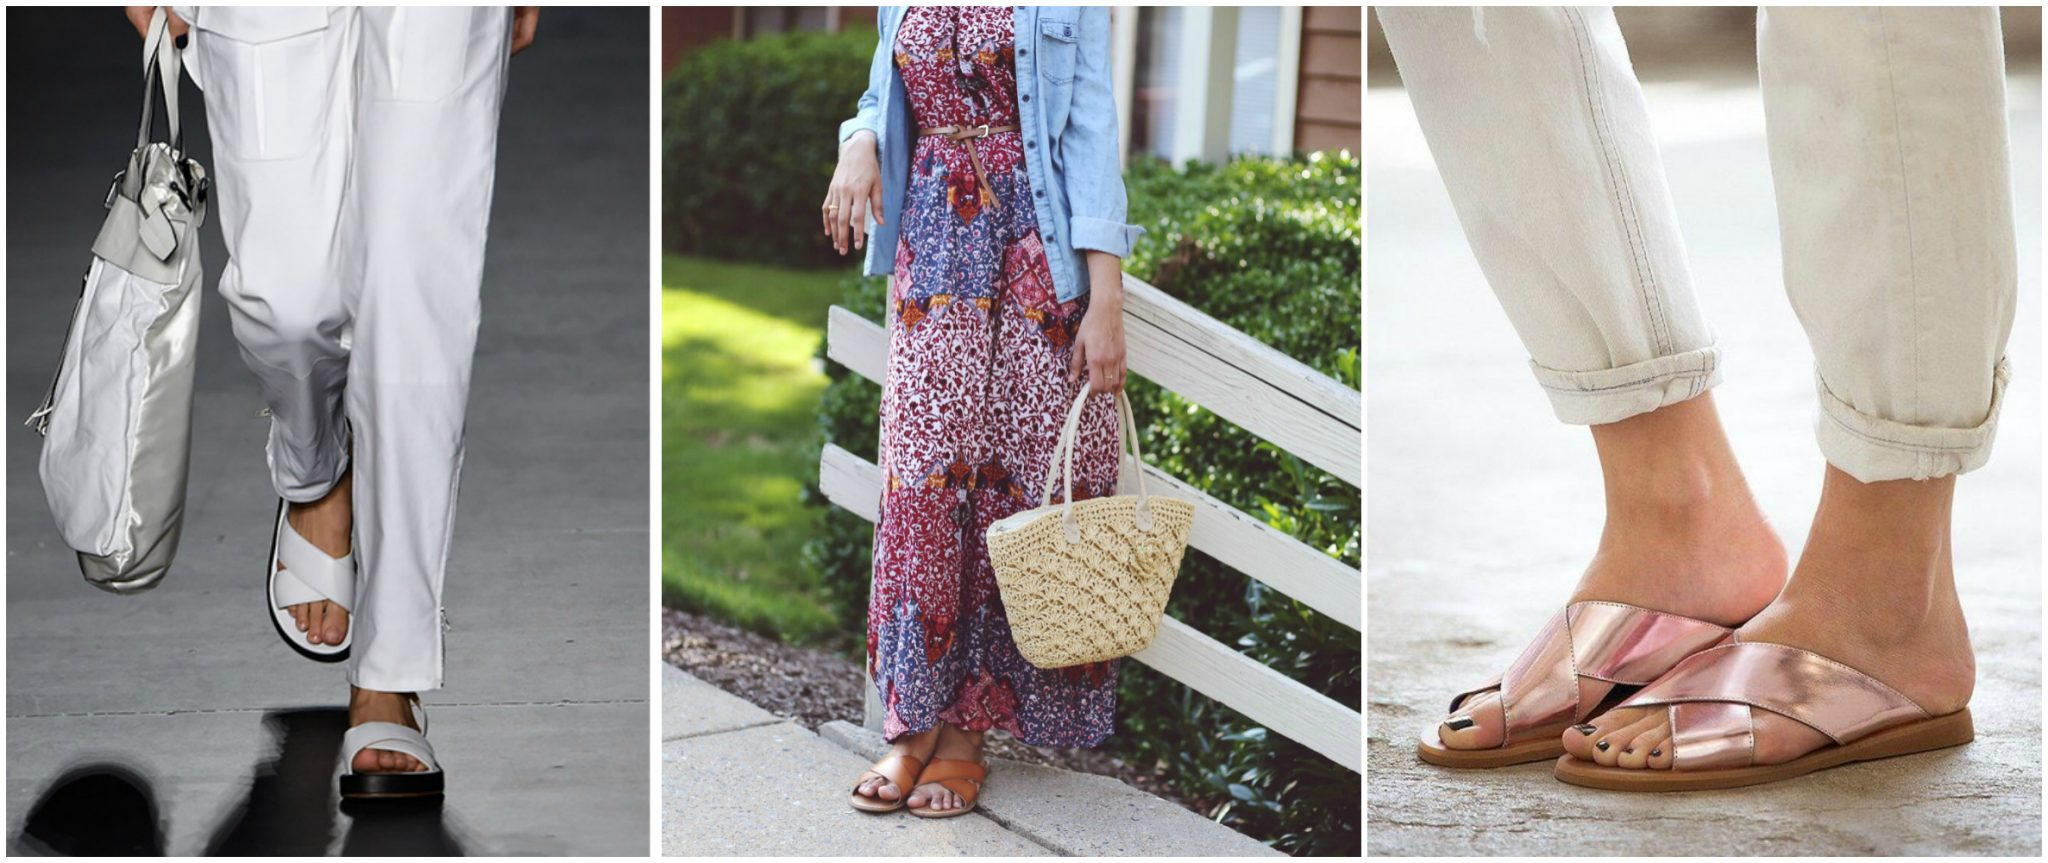 cross-strap-sandals-summer-trend-2016-dl